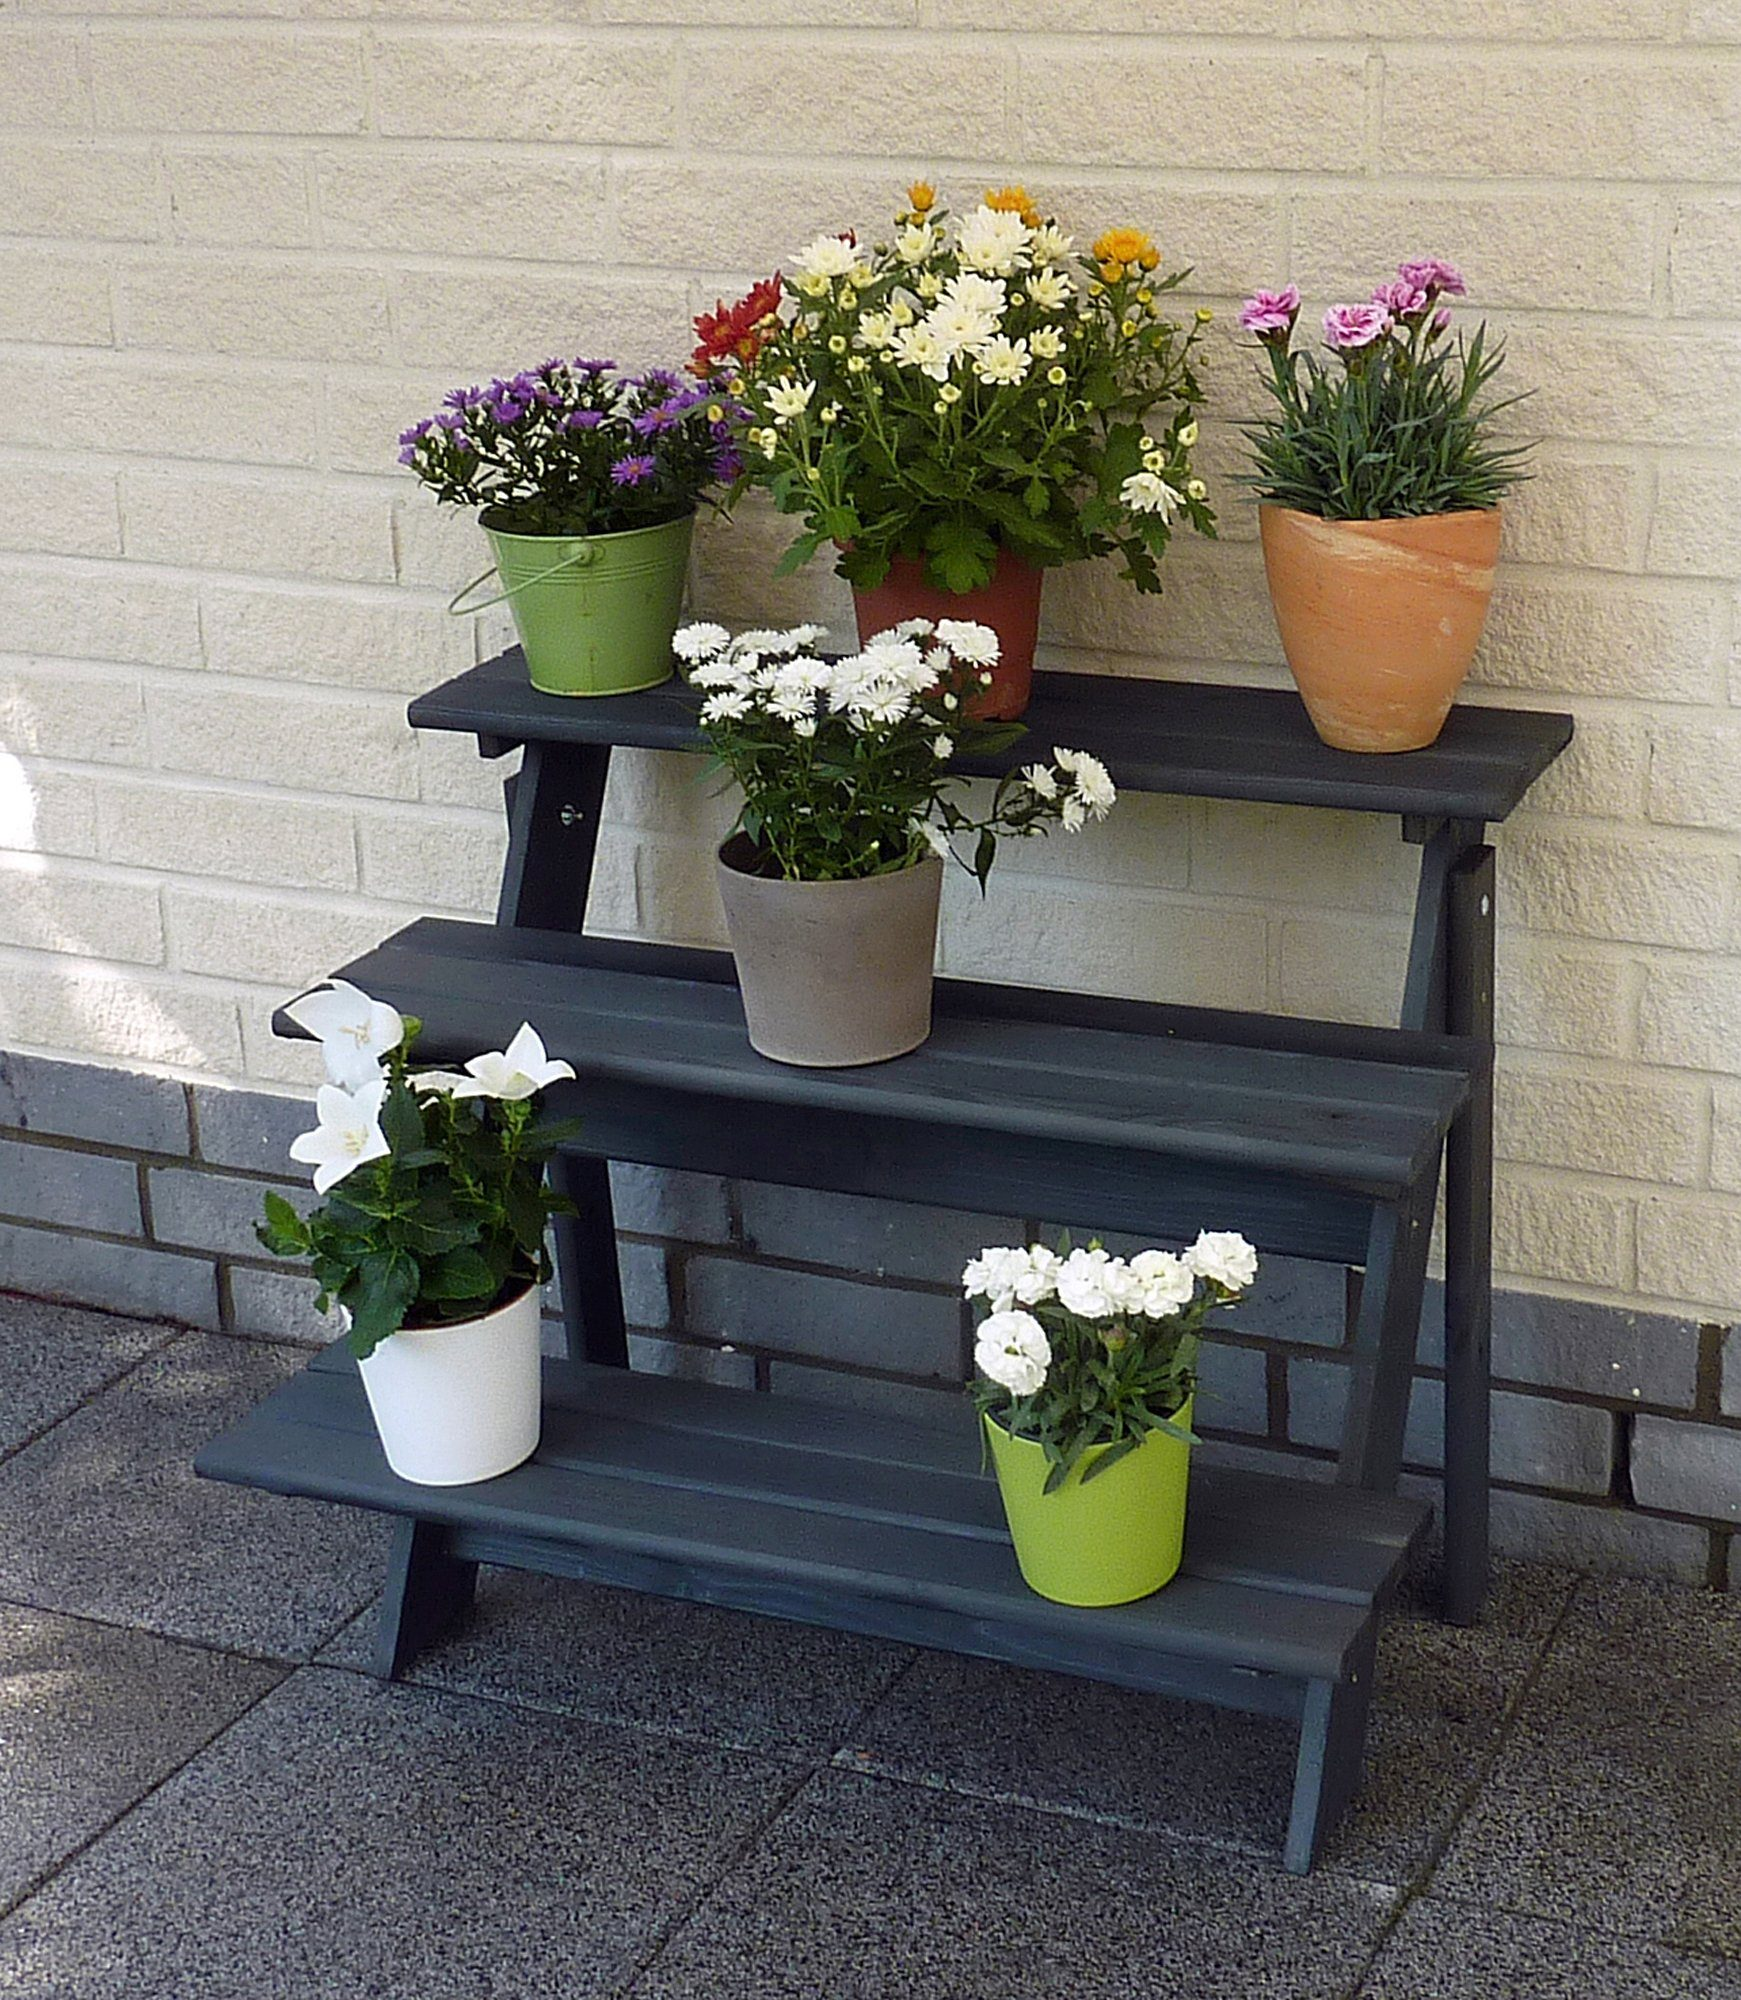 PROMADINO Blumentreppe »Anja«, BxTxH: 78x55x62 cm